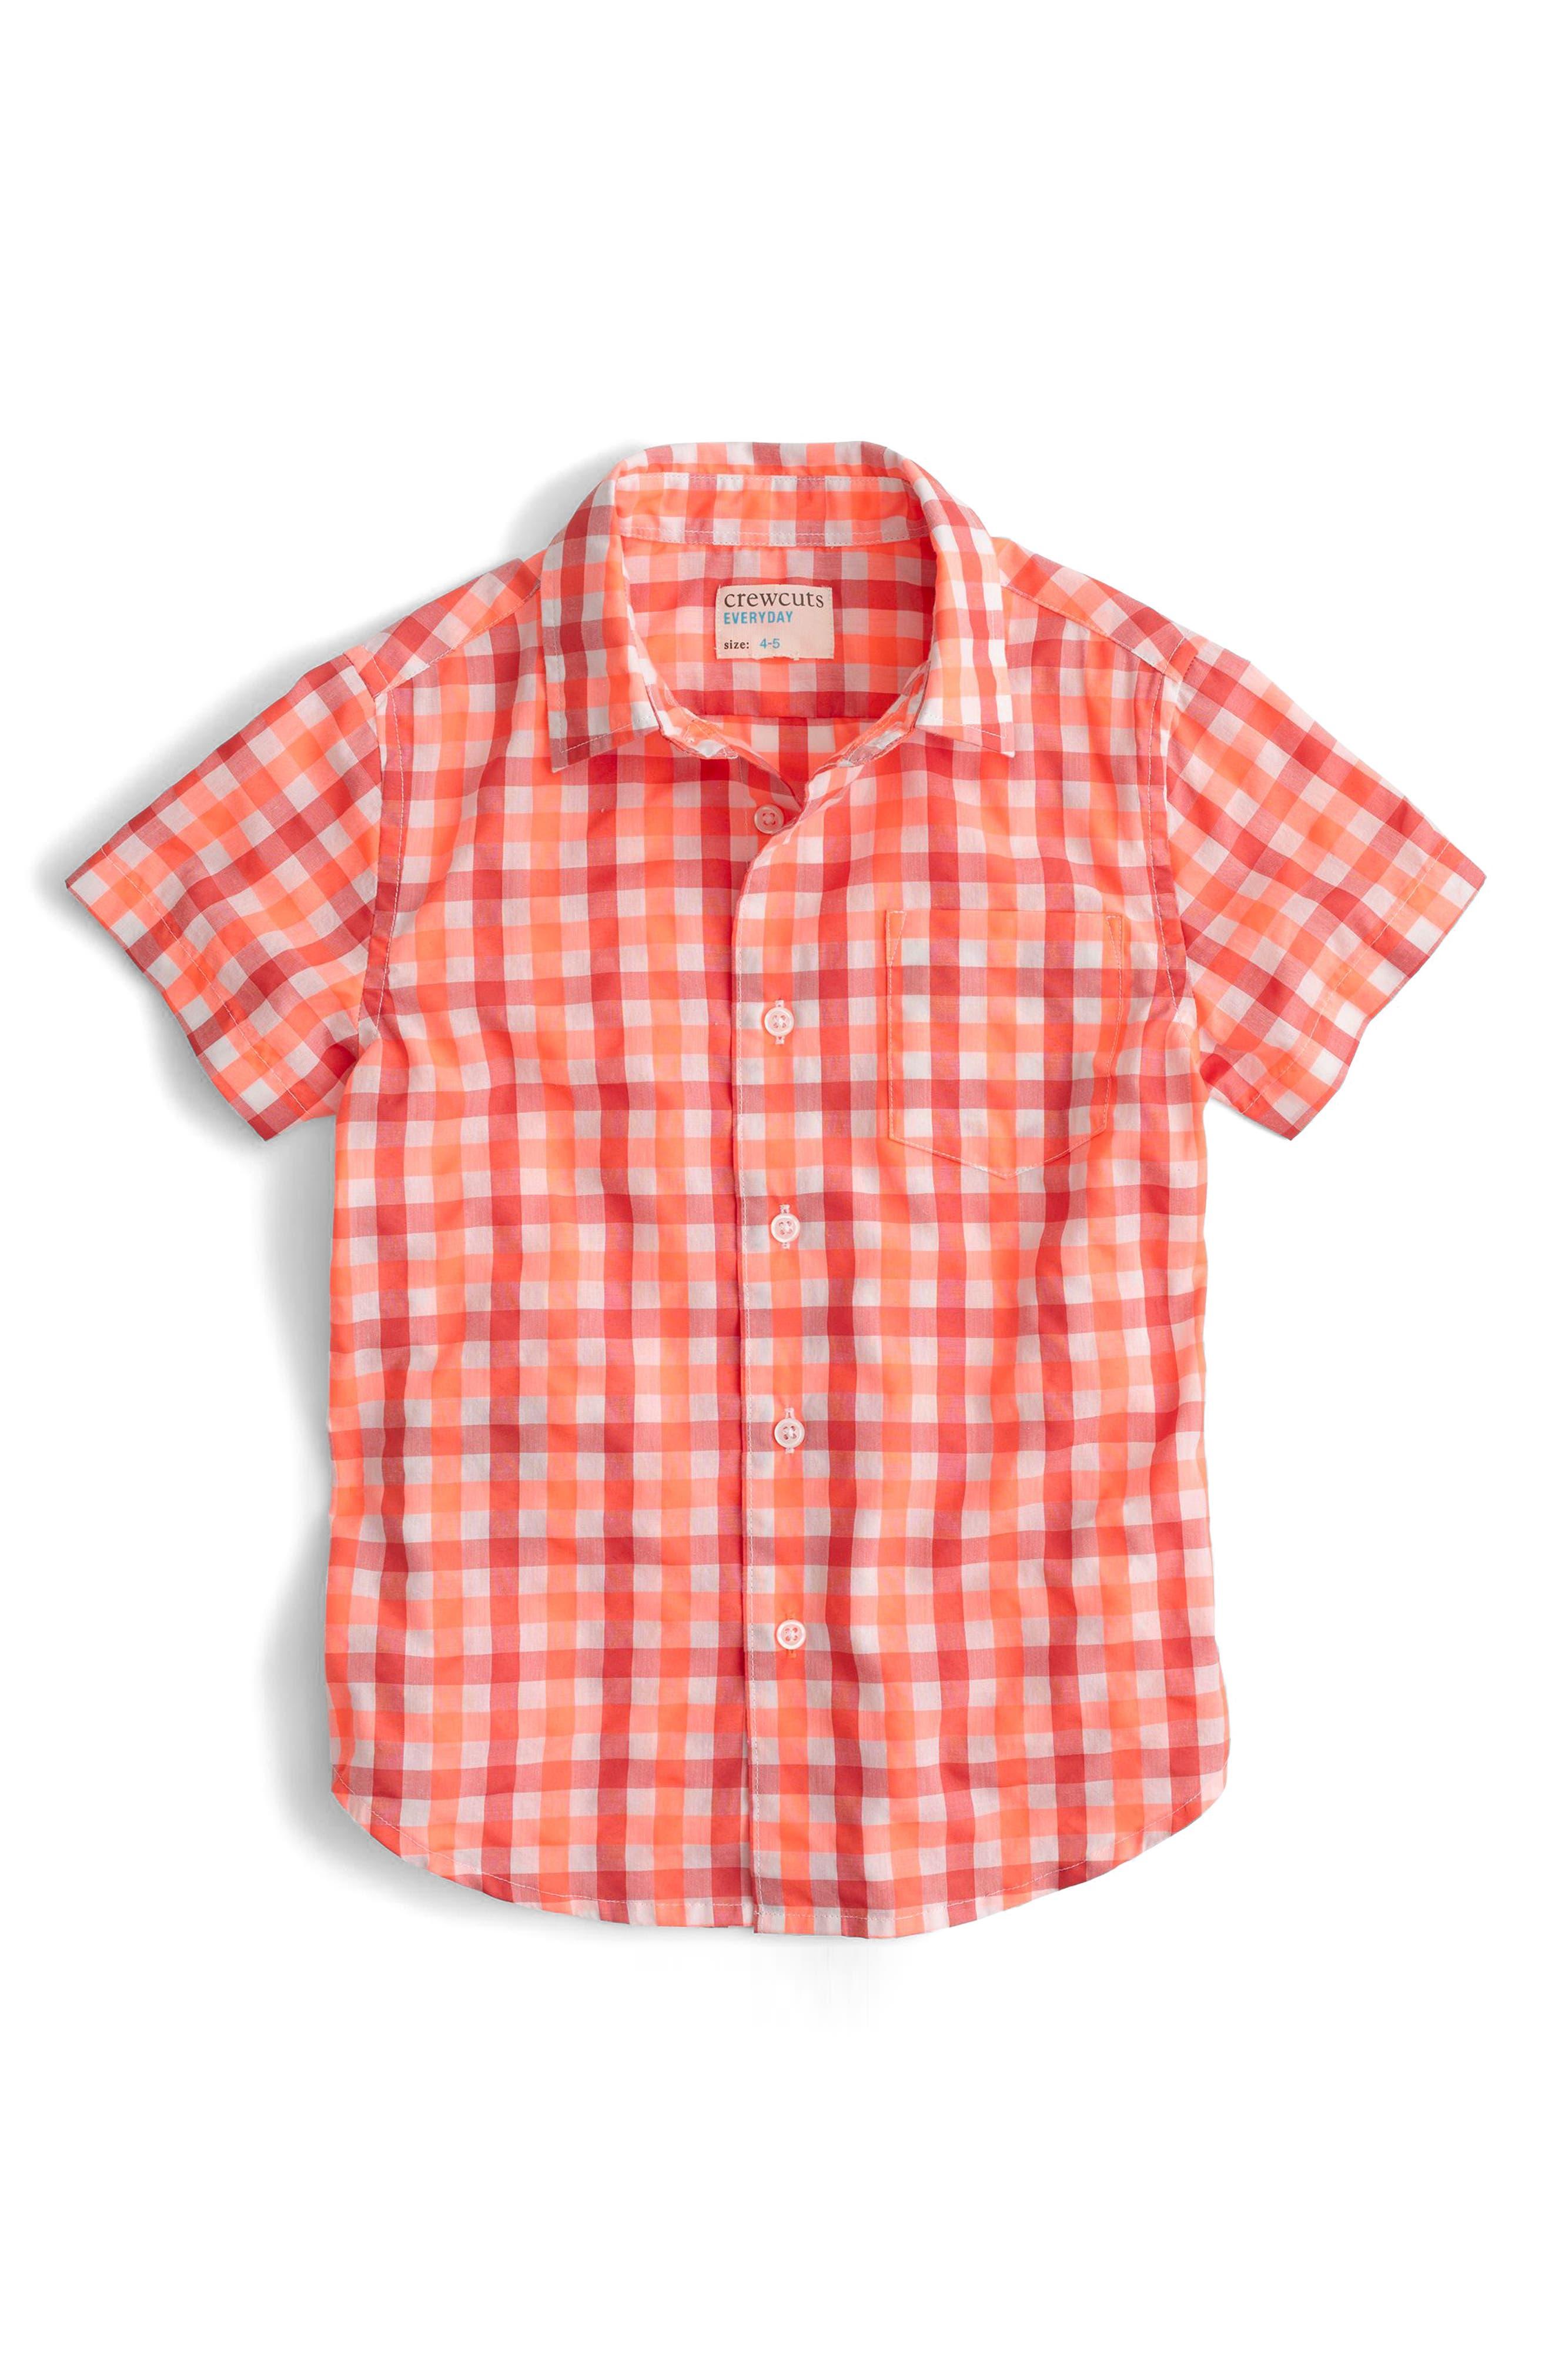 crewcuts by J.Crew Secret Wash Short Sleeve Gingham Shirt (Toddler Boys, Little Boys & Big Boys)